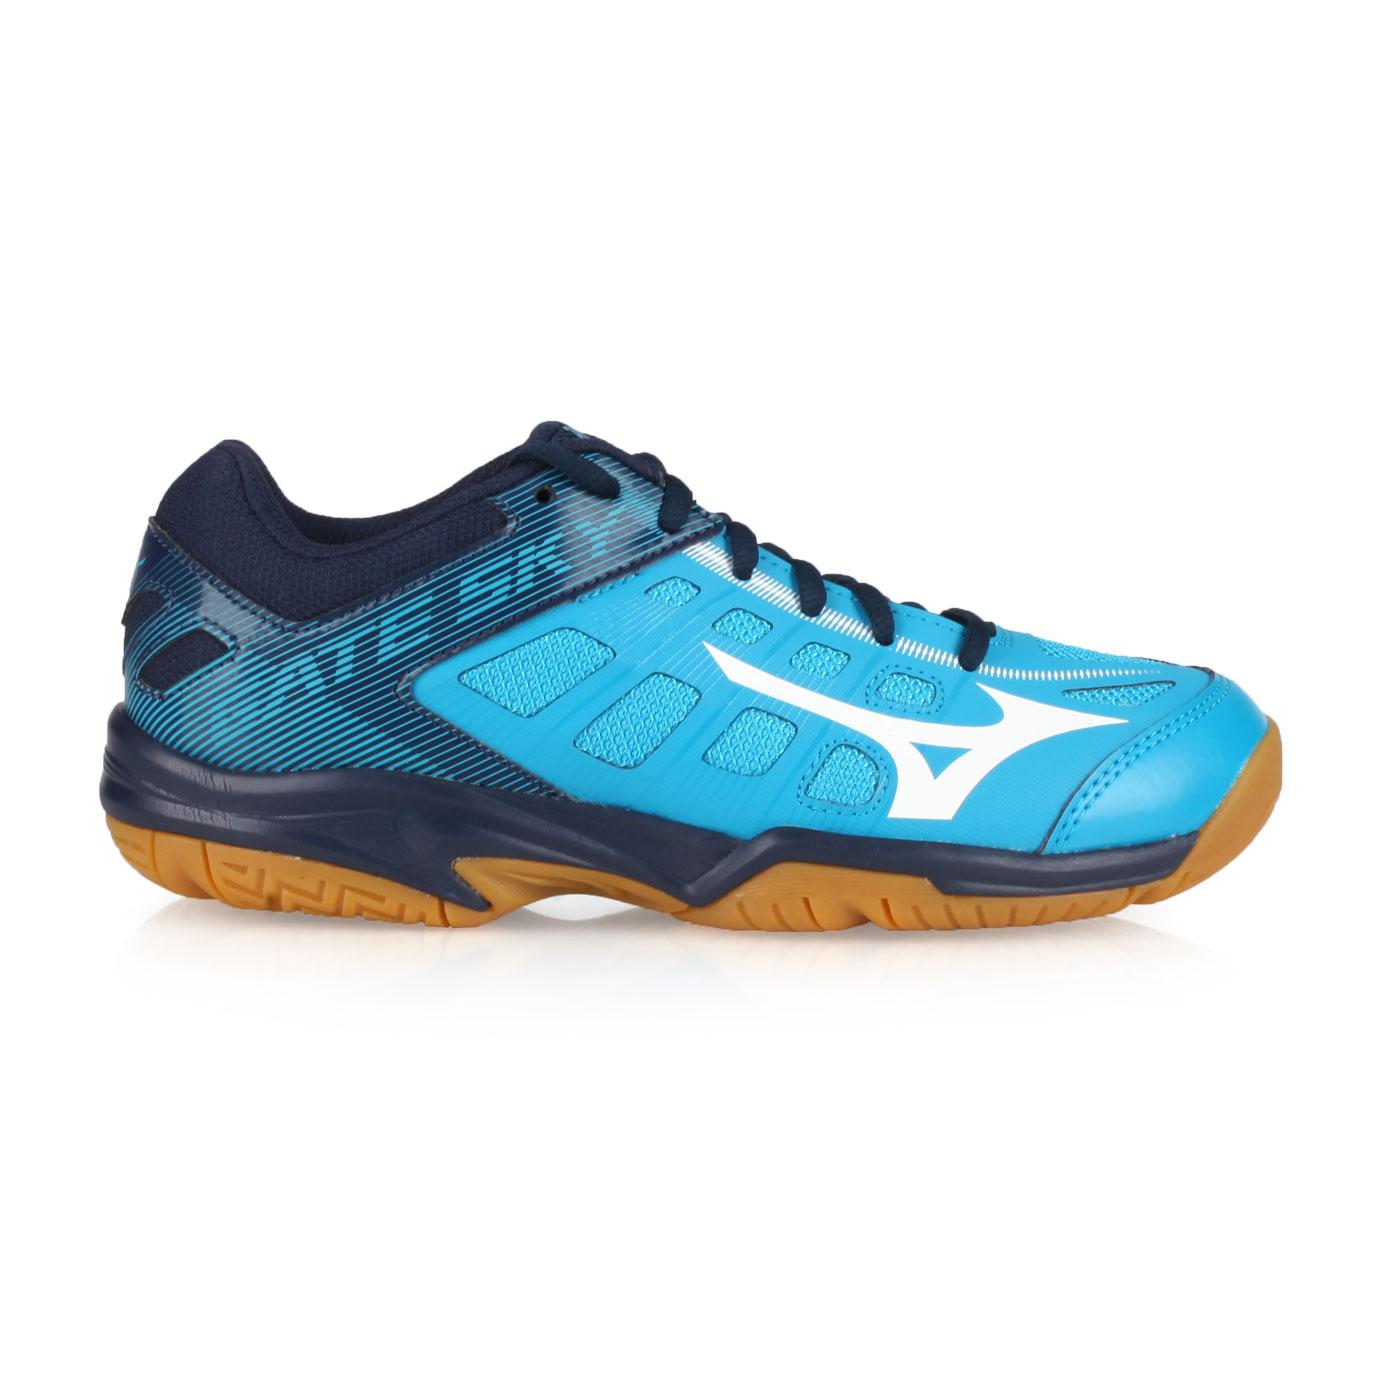 MIZUNO 羽球鞋  @GATE SKY 2@71GA194001 - 水藍深藍白